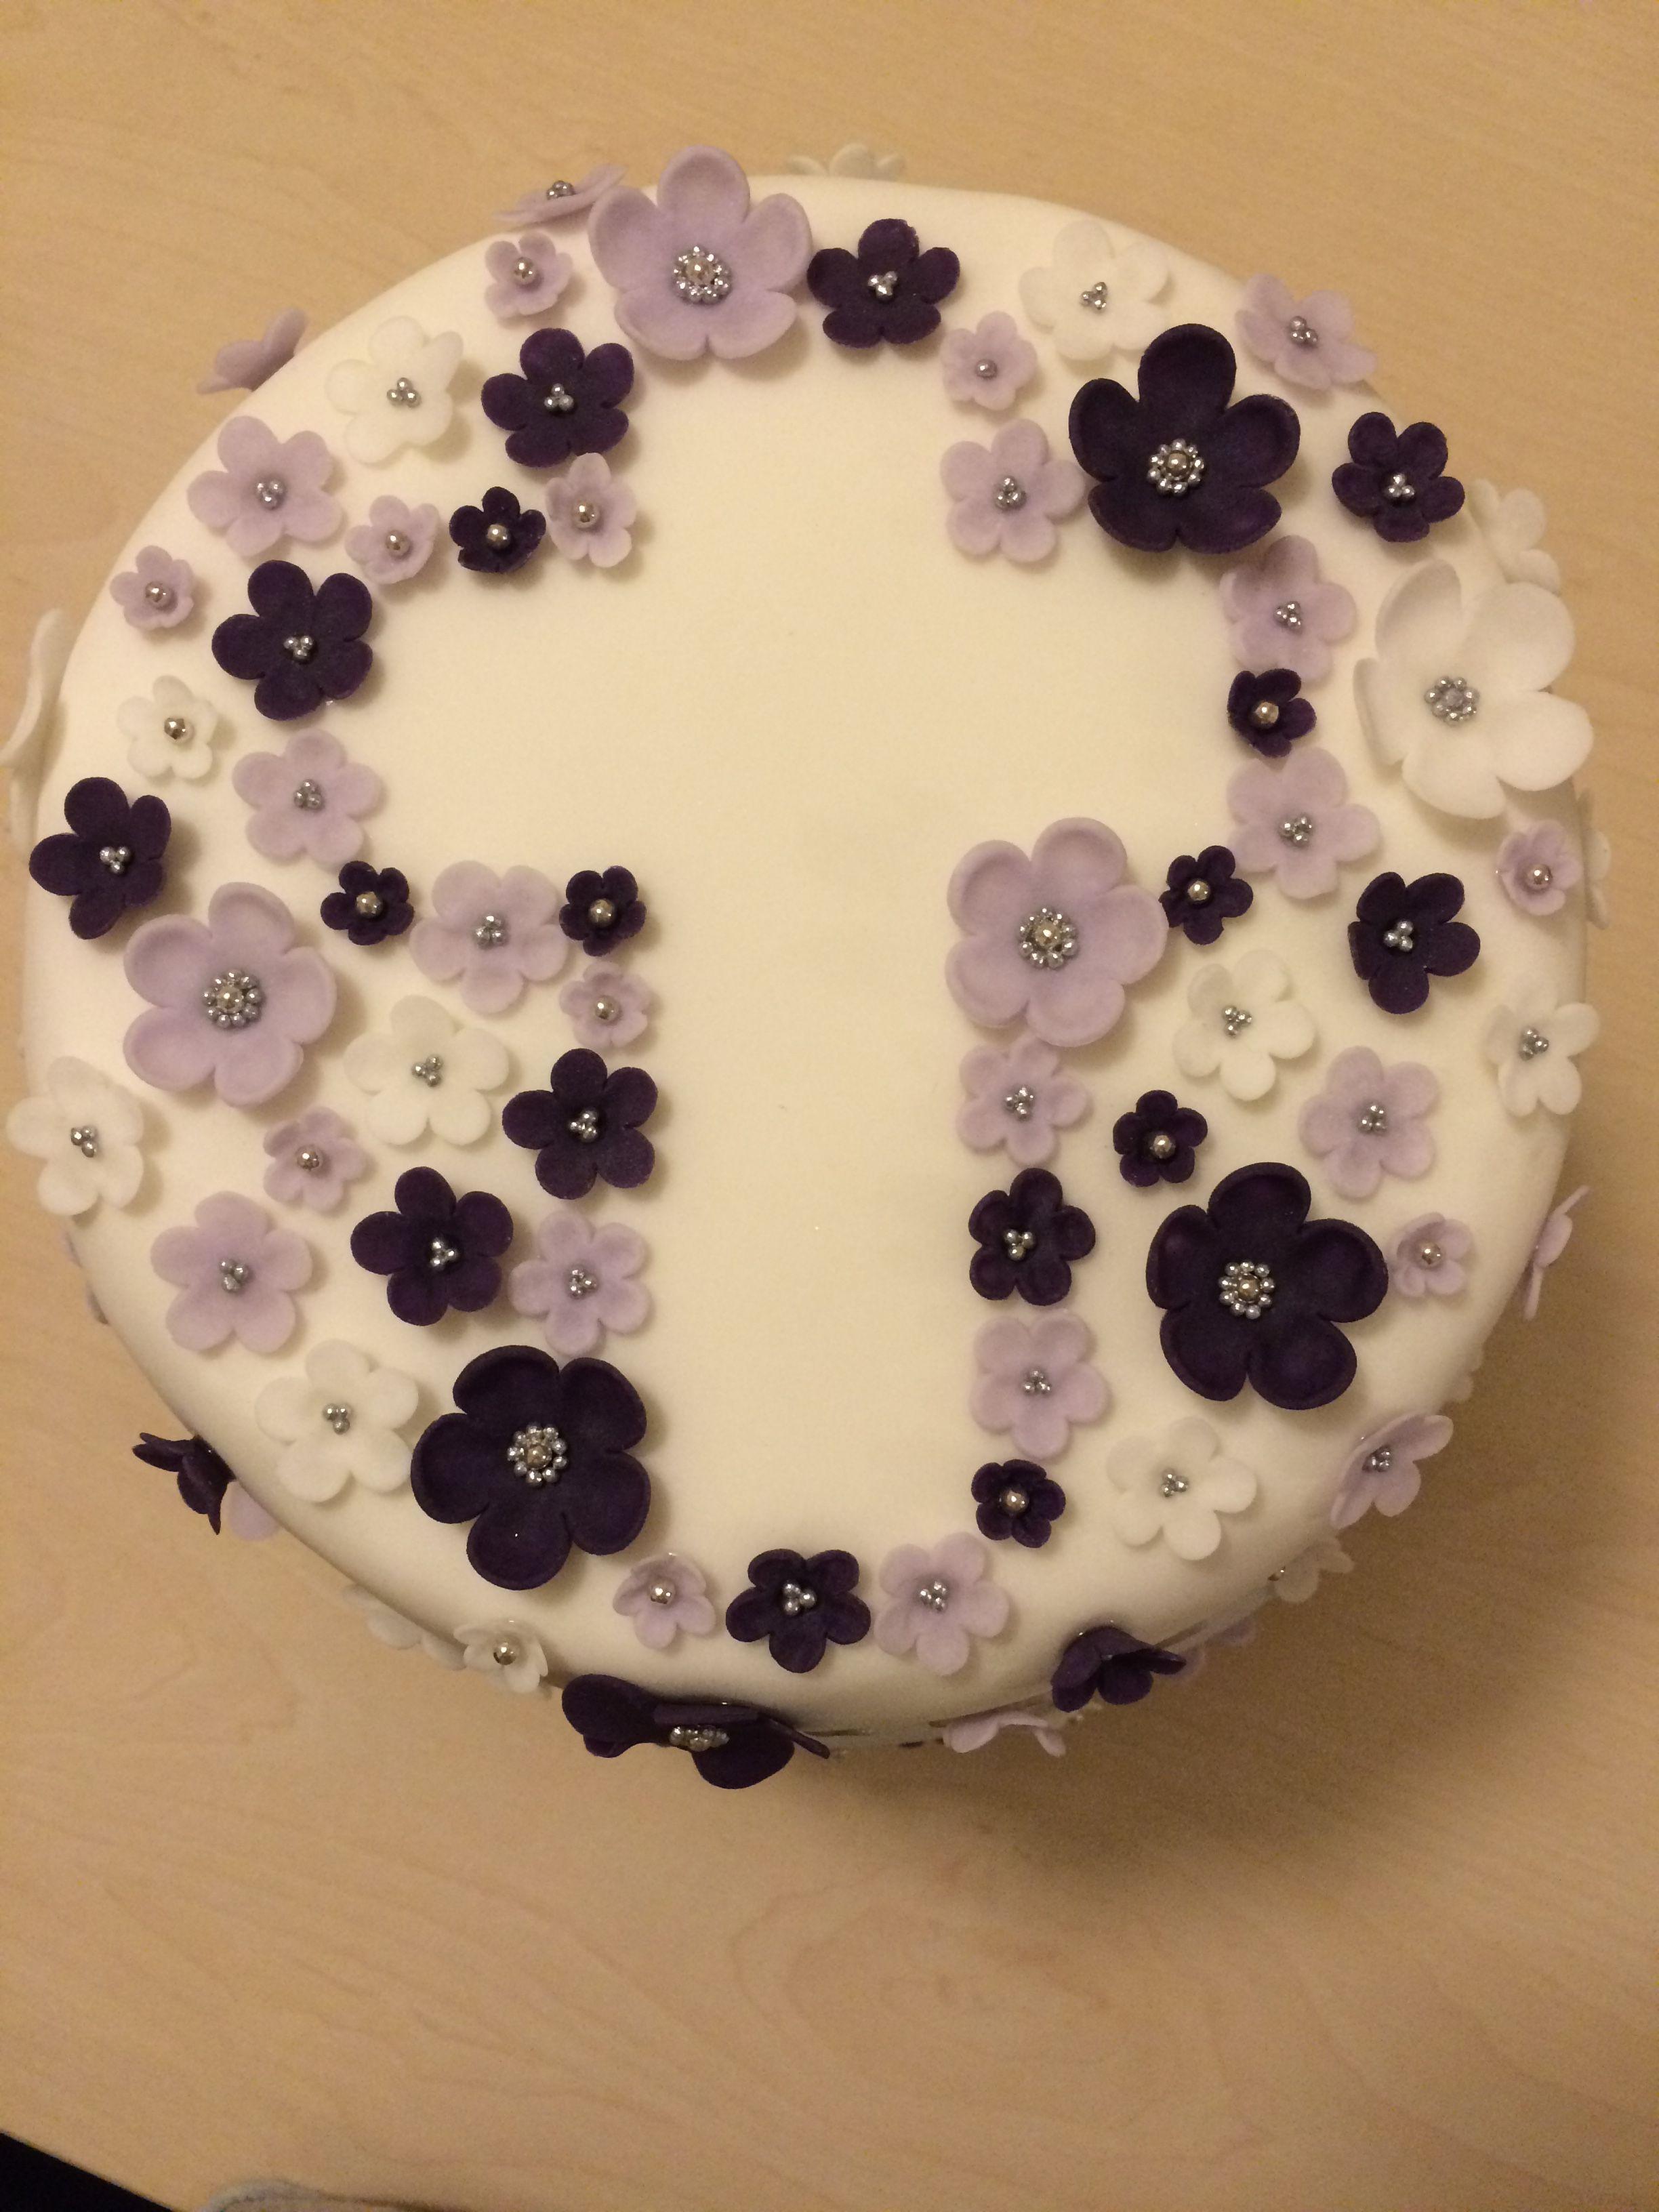 Torte Taufe Kommunion Firmung Blumen Kommunion Firmung